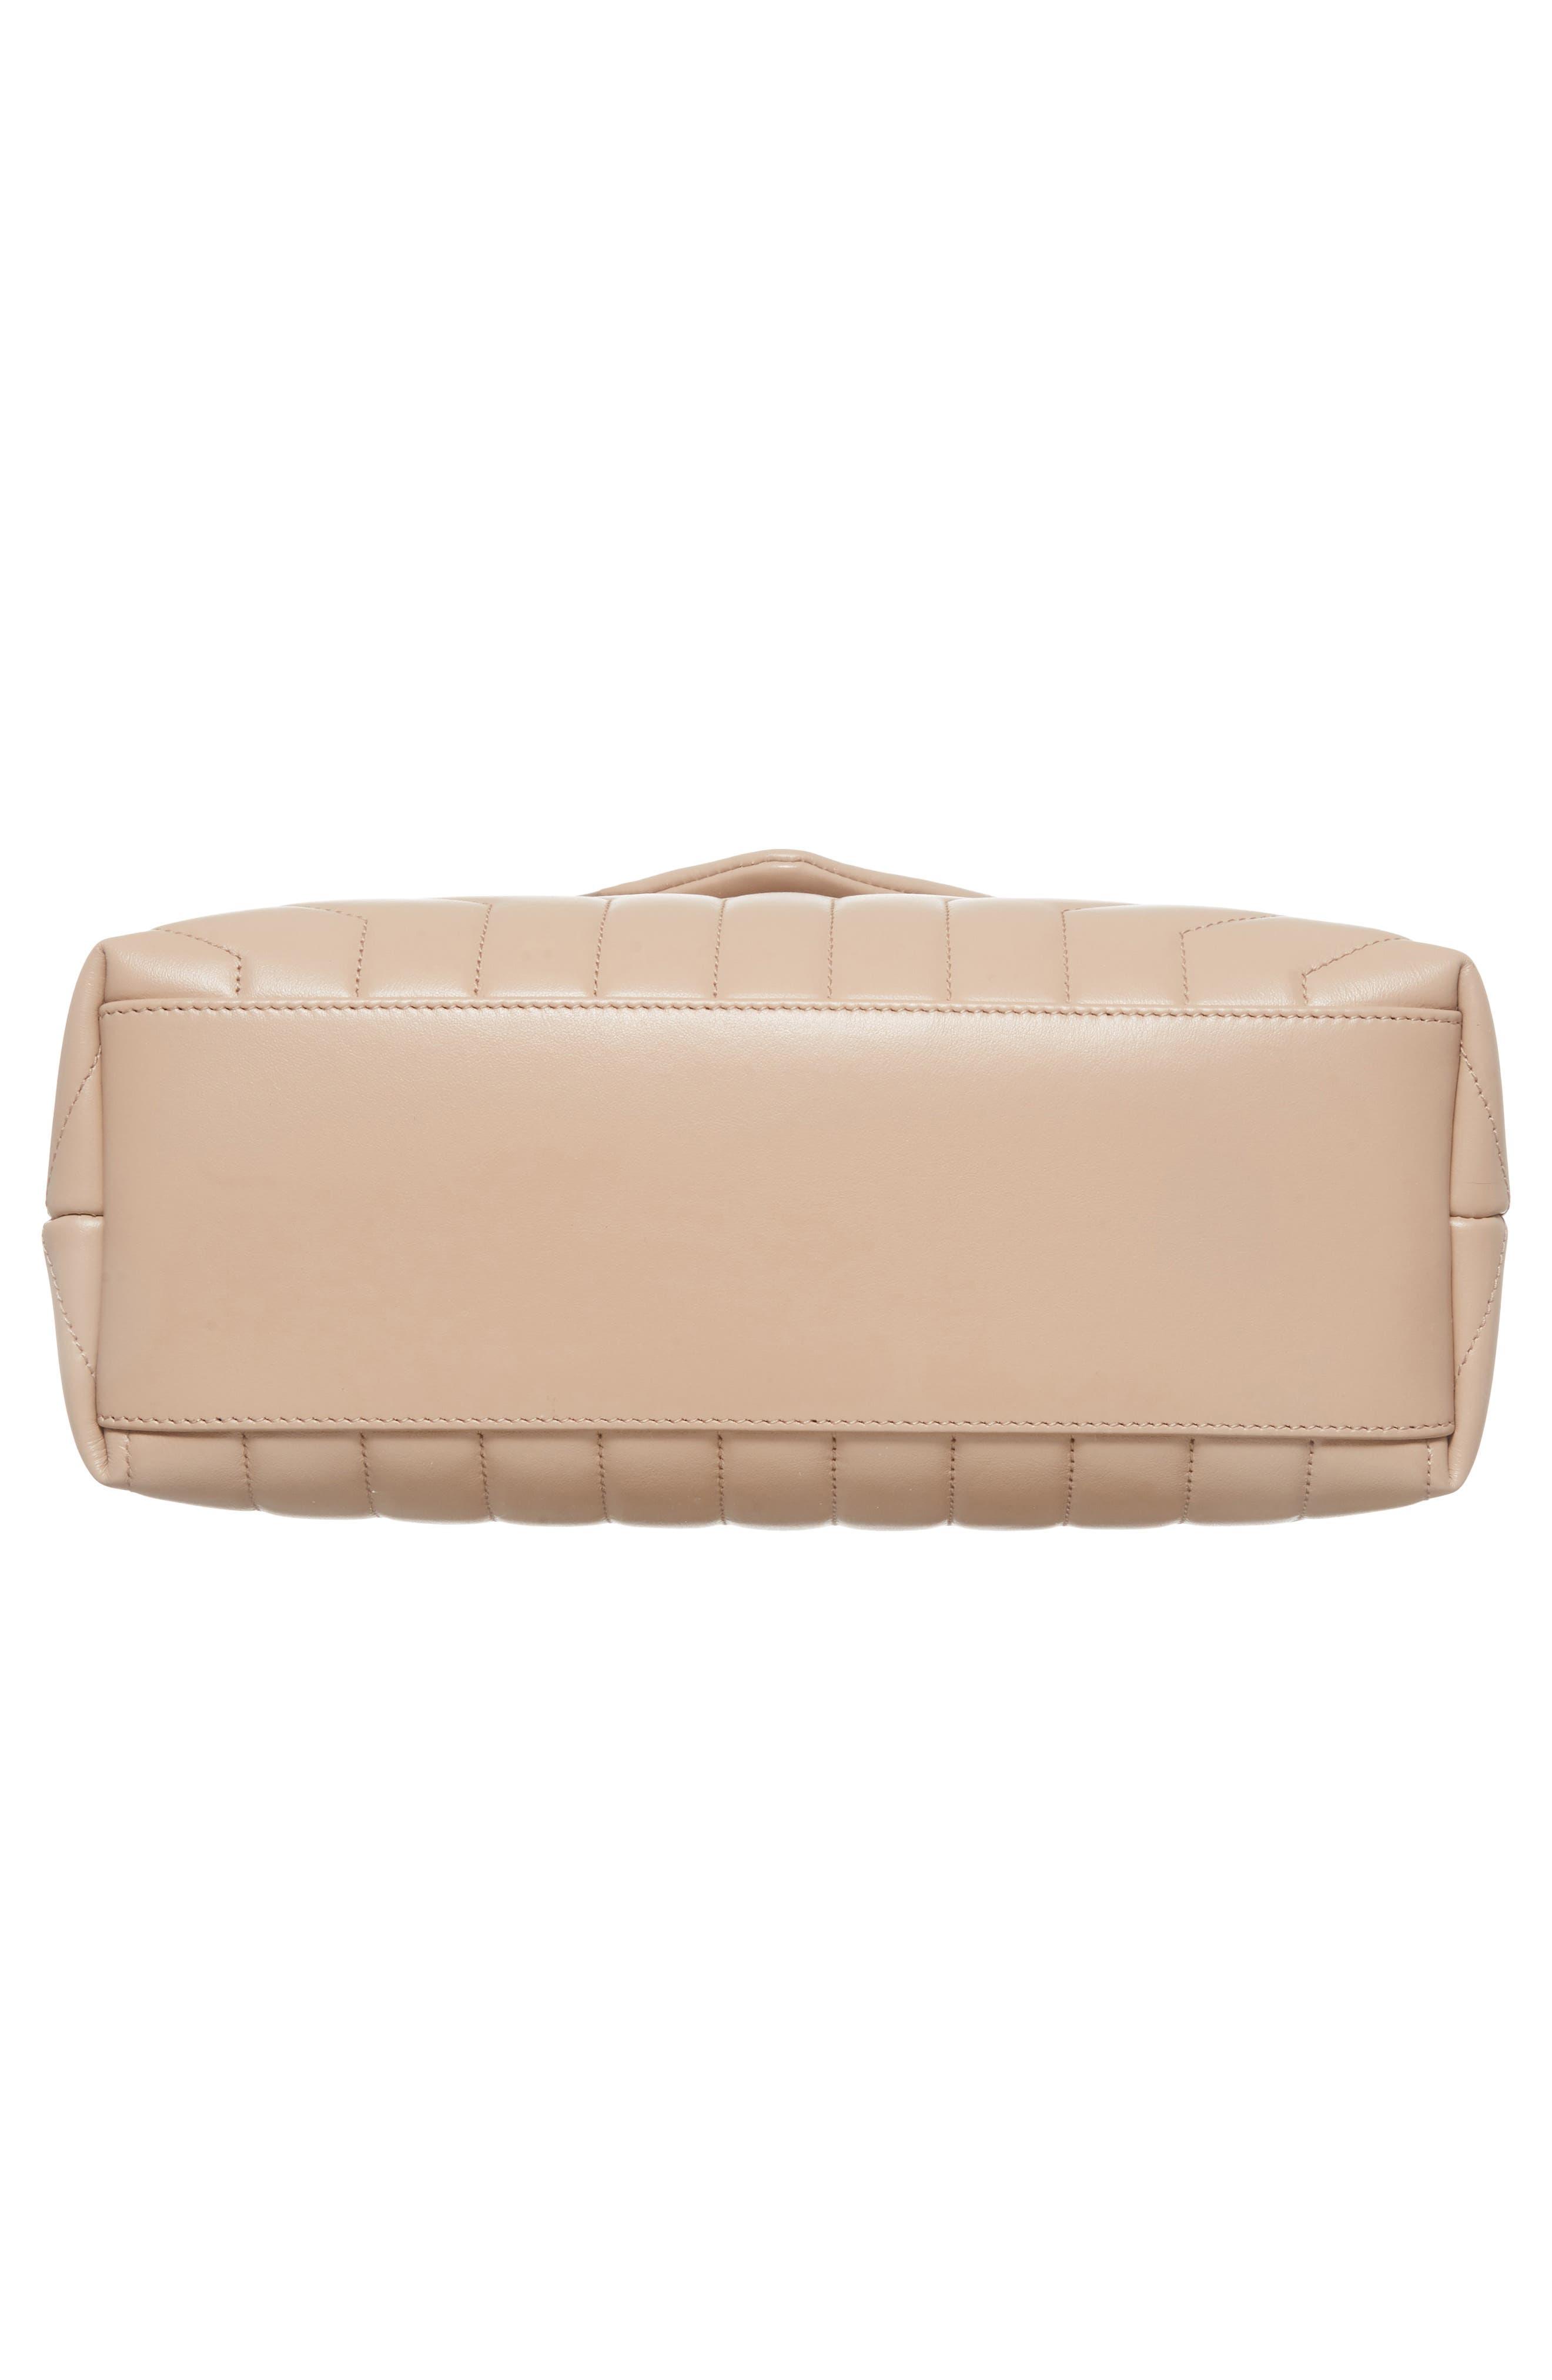 Medium Loulou Matelassé Calfskin Leather Shoulder Bag,                             Alternate thumbnail 6, color,                             LIGHT NATURAL